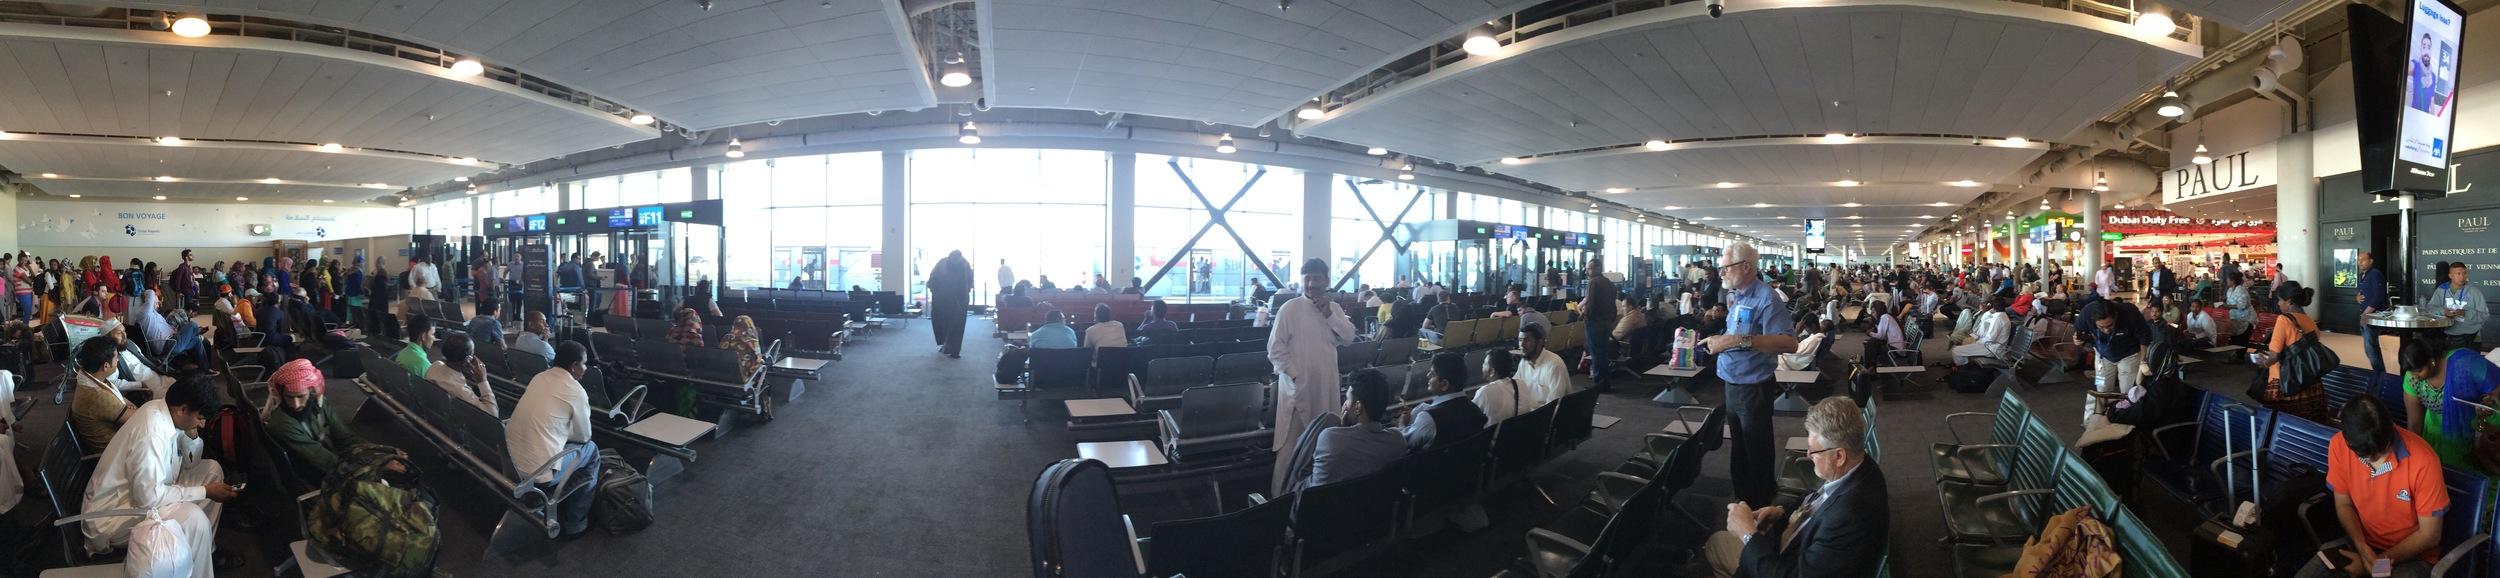 Dubai Terminal 2, awaiting flight to Juba